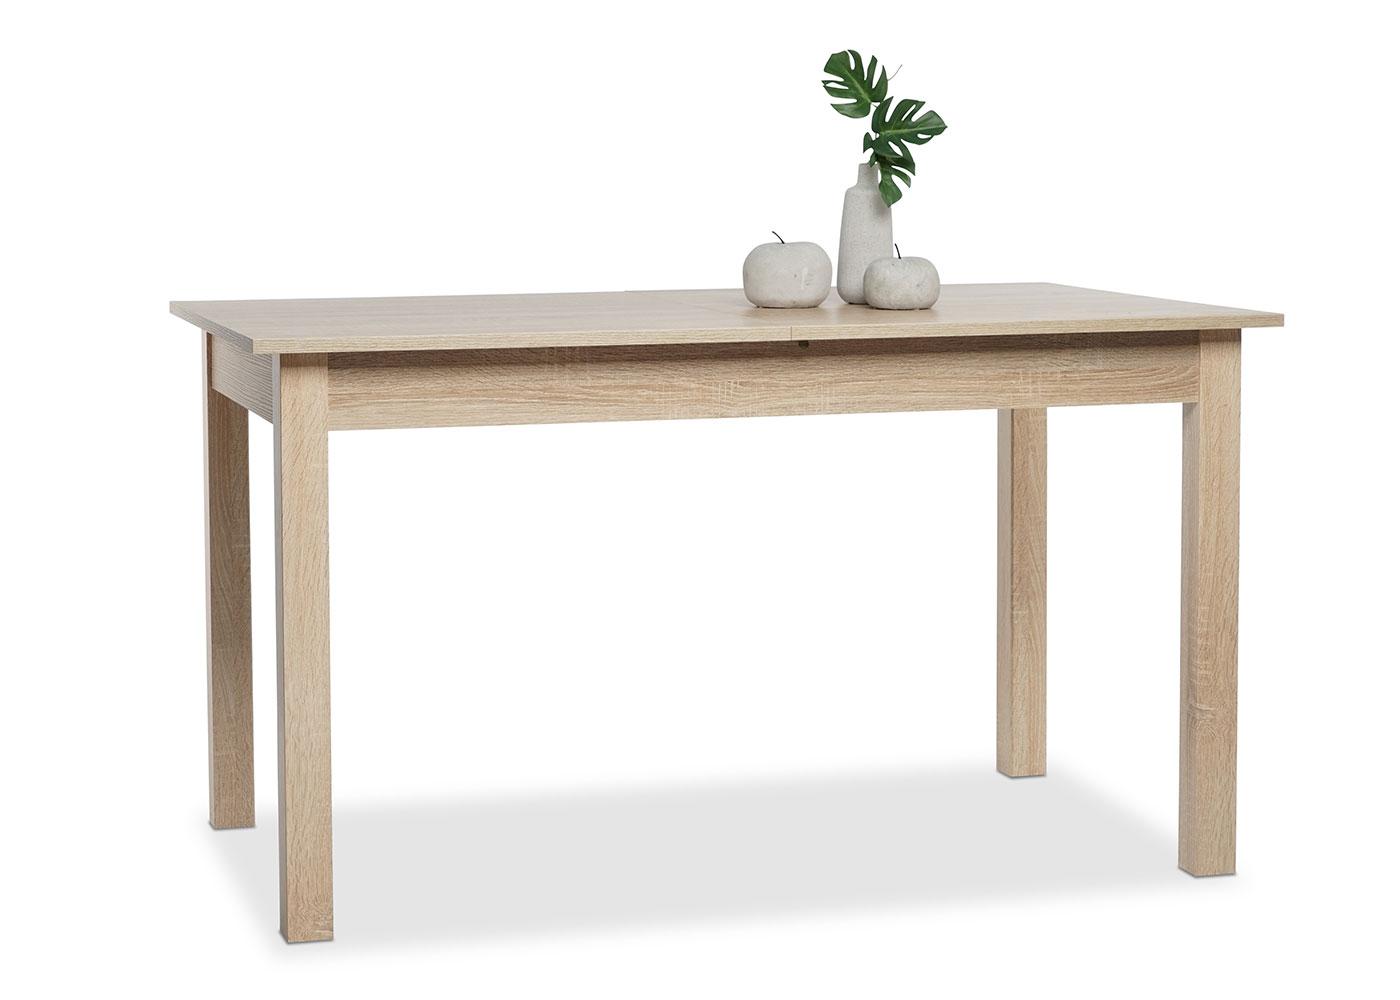 Jedálny stôl rozkladací Kronborg, 160 cm, dub, dub